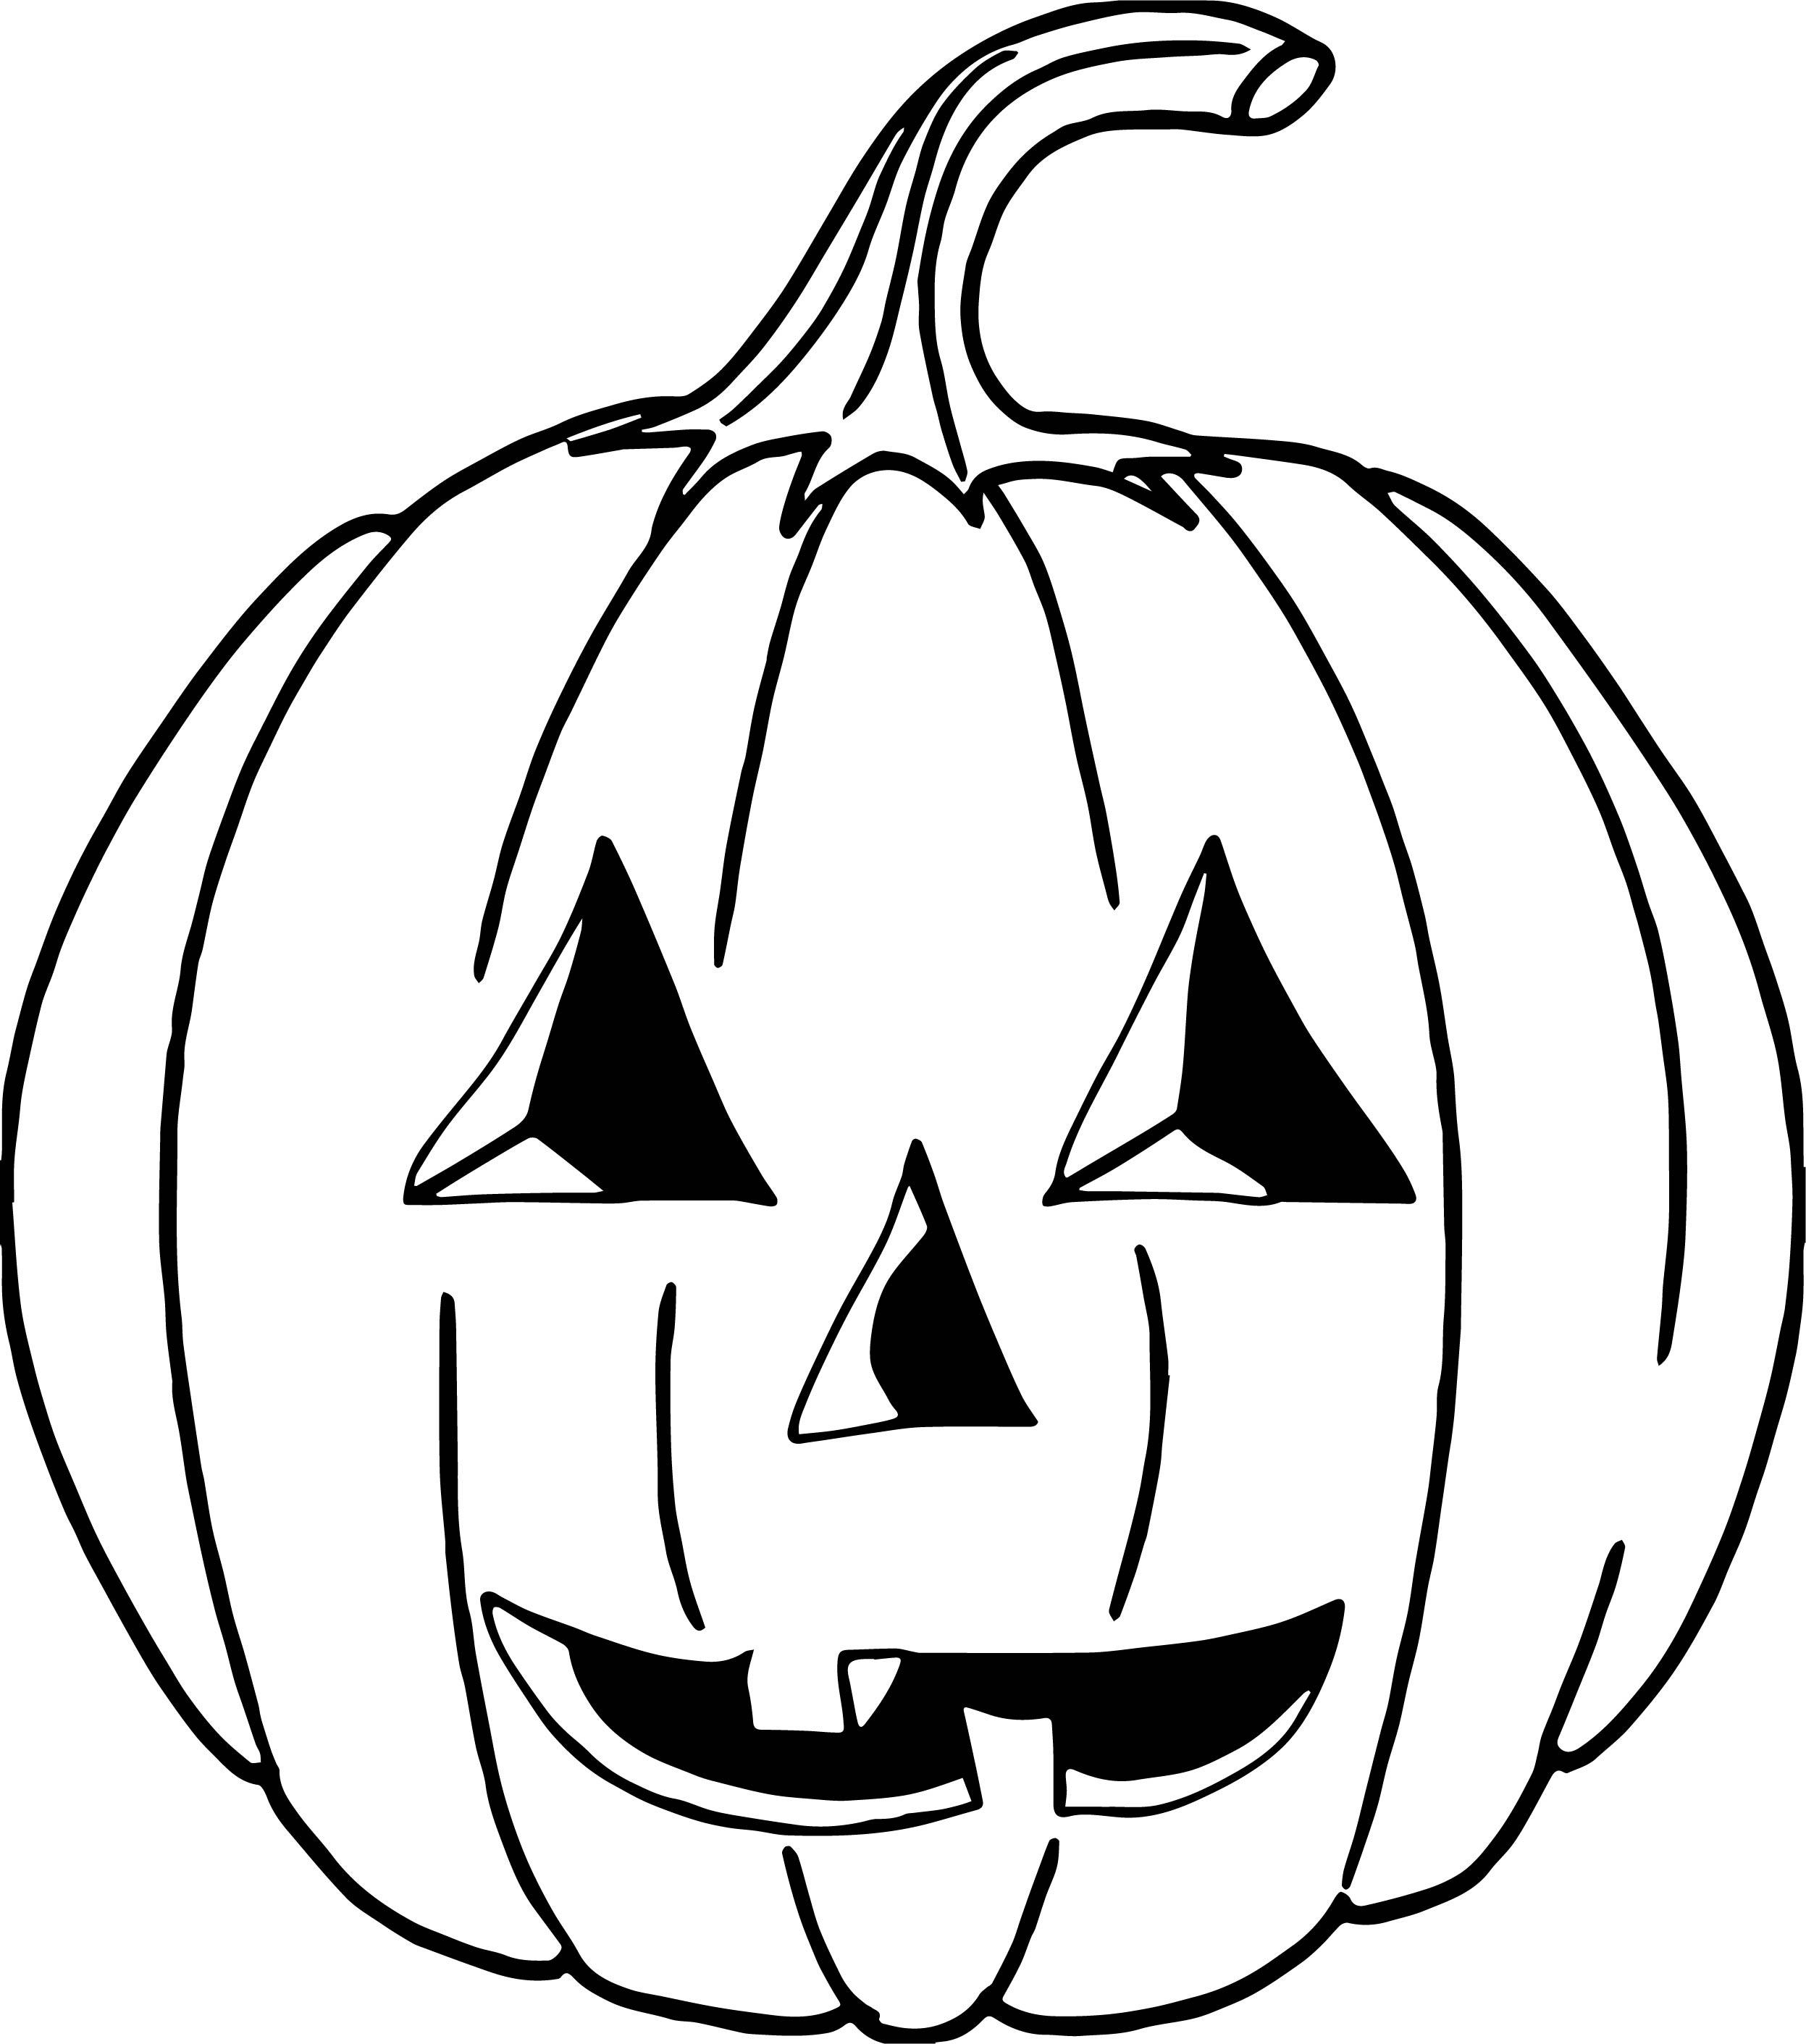 Friendly Looking Halloween Pumpkin Or Jack O Lantern Coloring Page